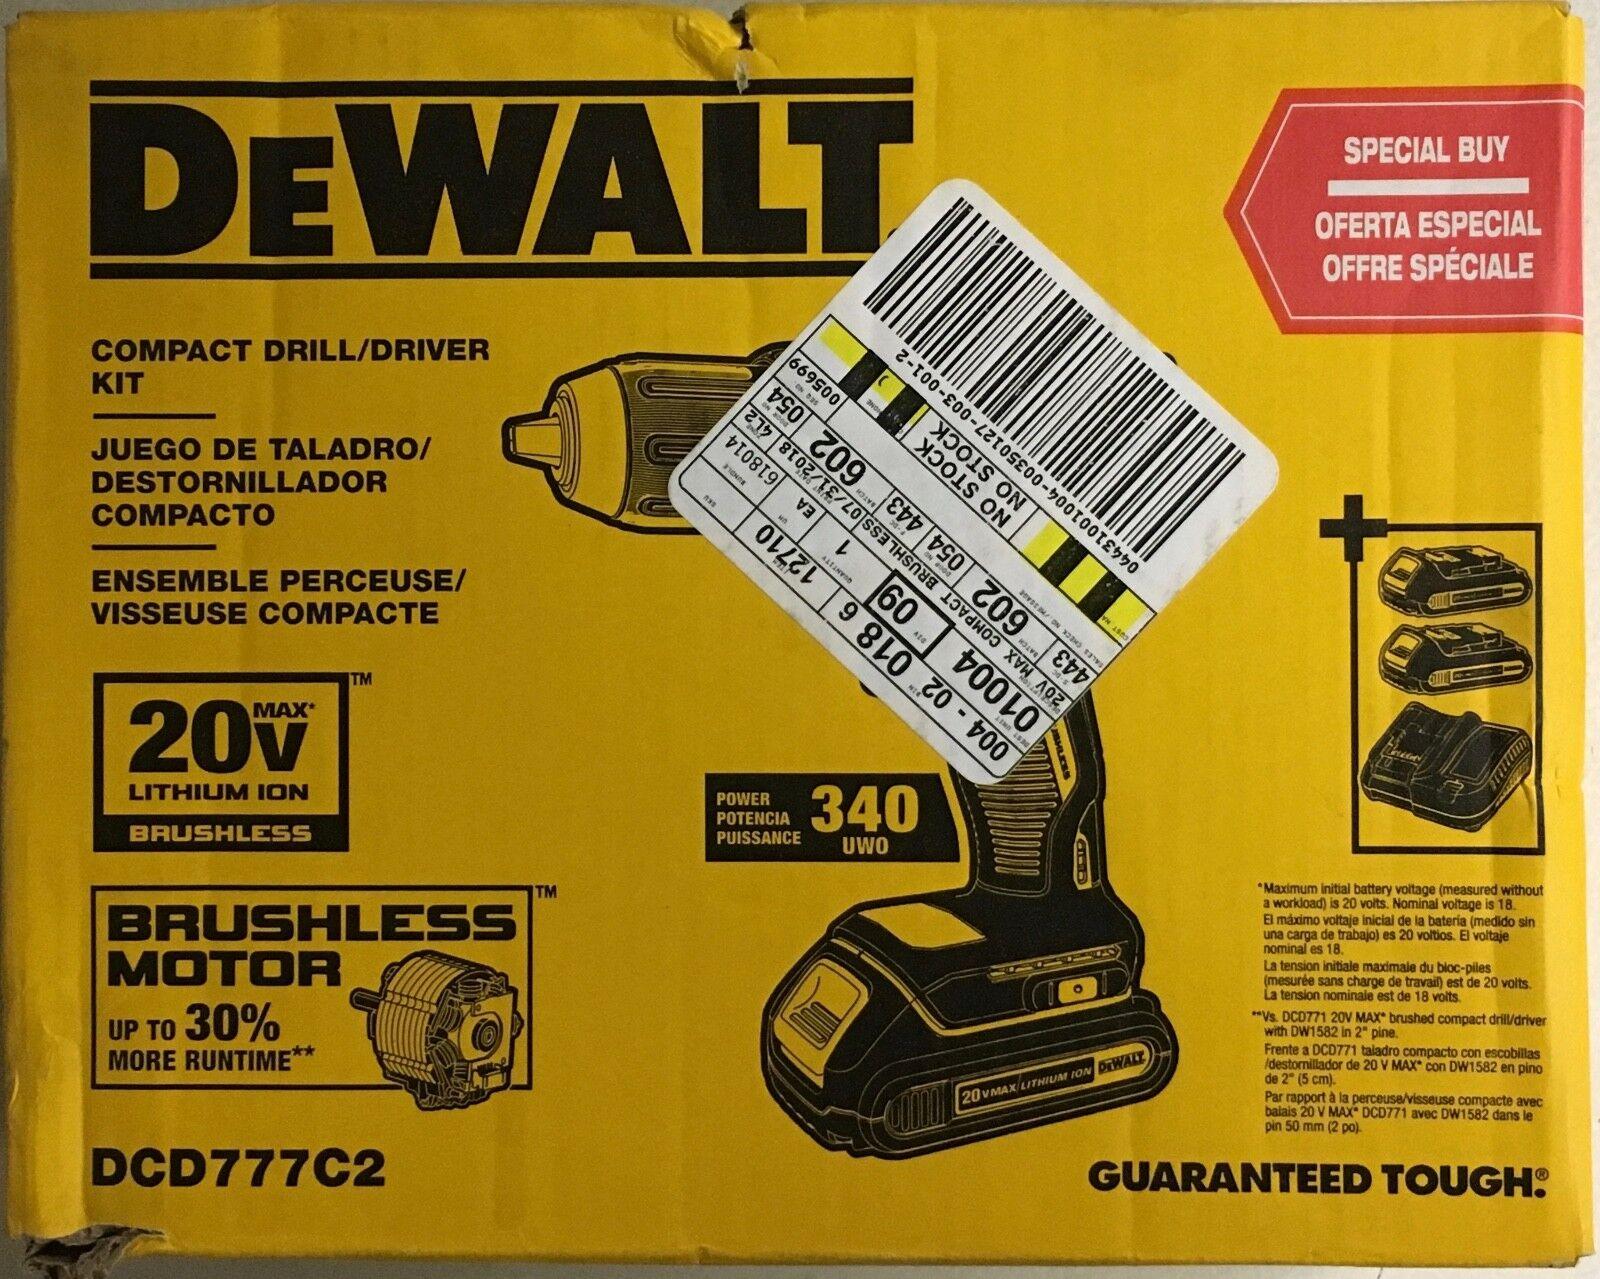 DEWALT DCD777C2 20V Max Lithium-Ion Brushless Compact Drill